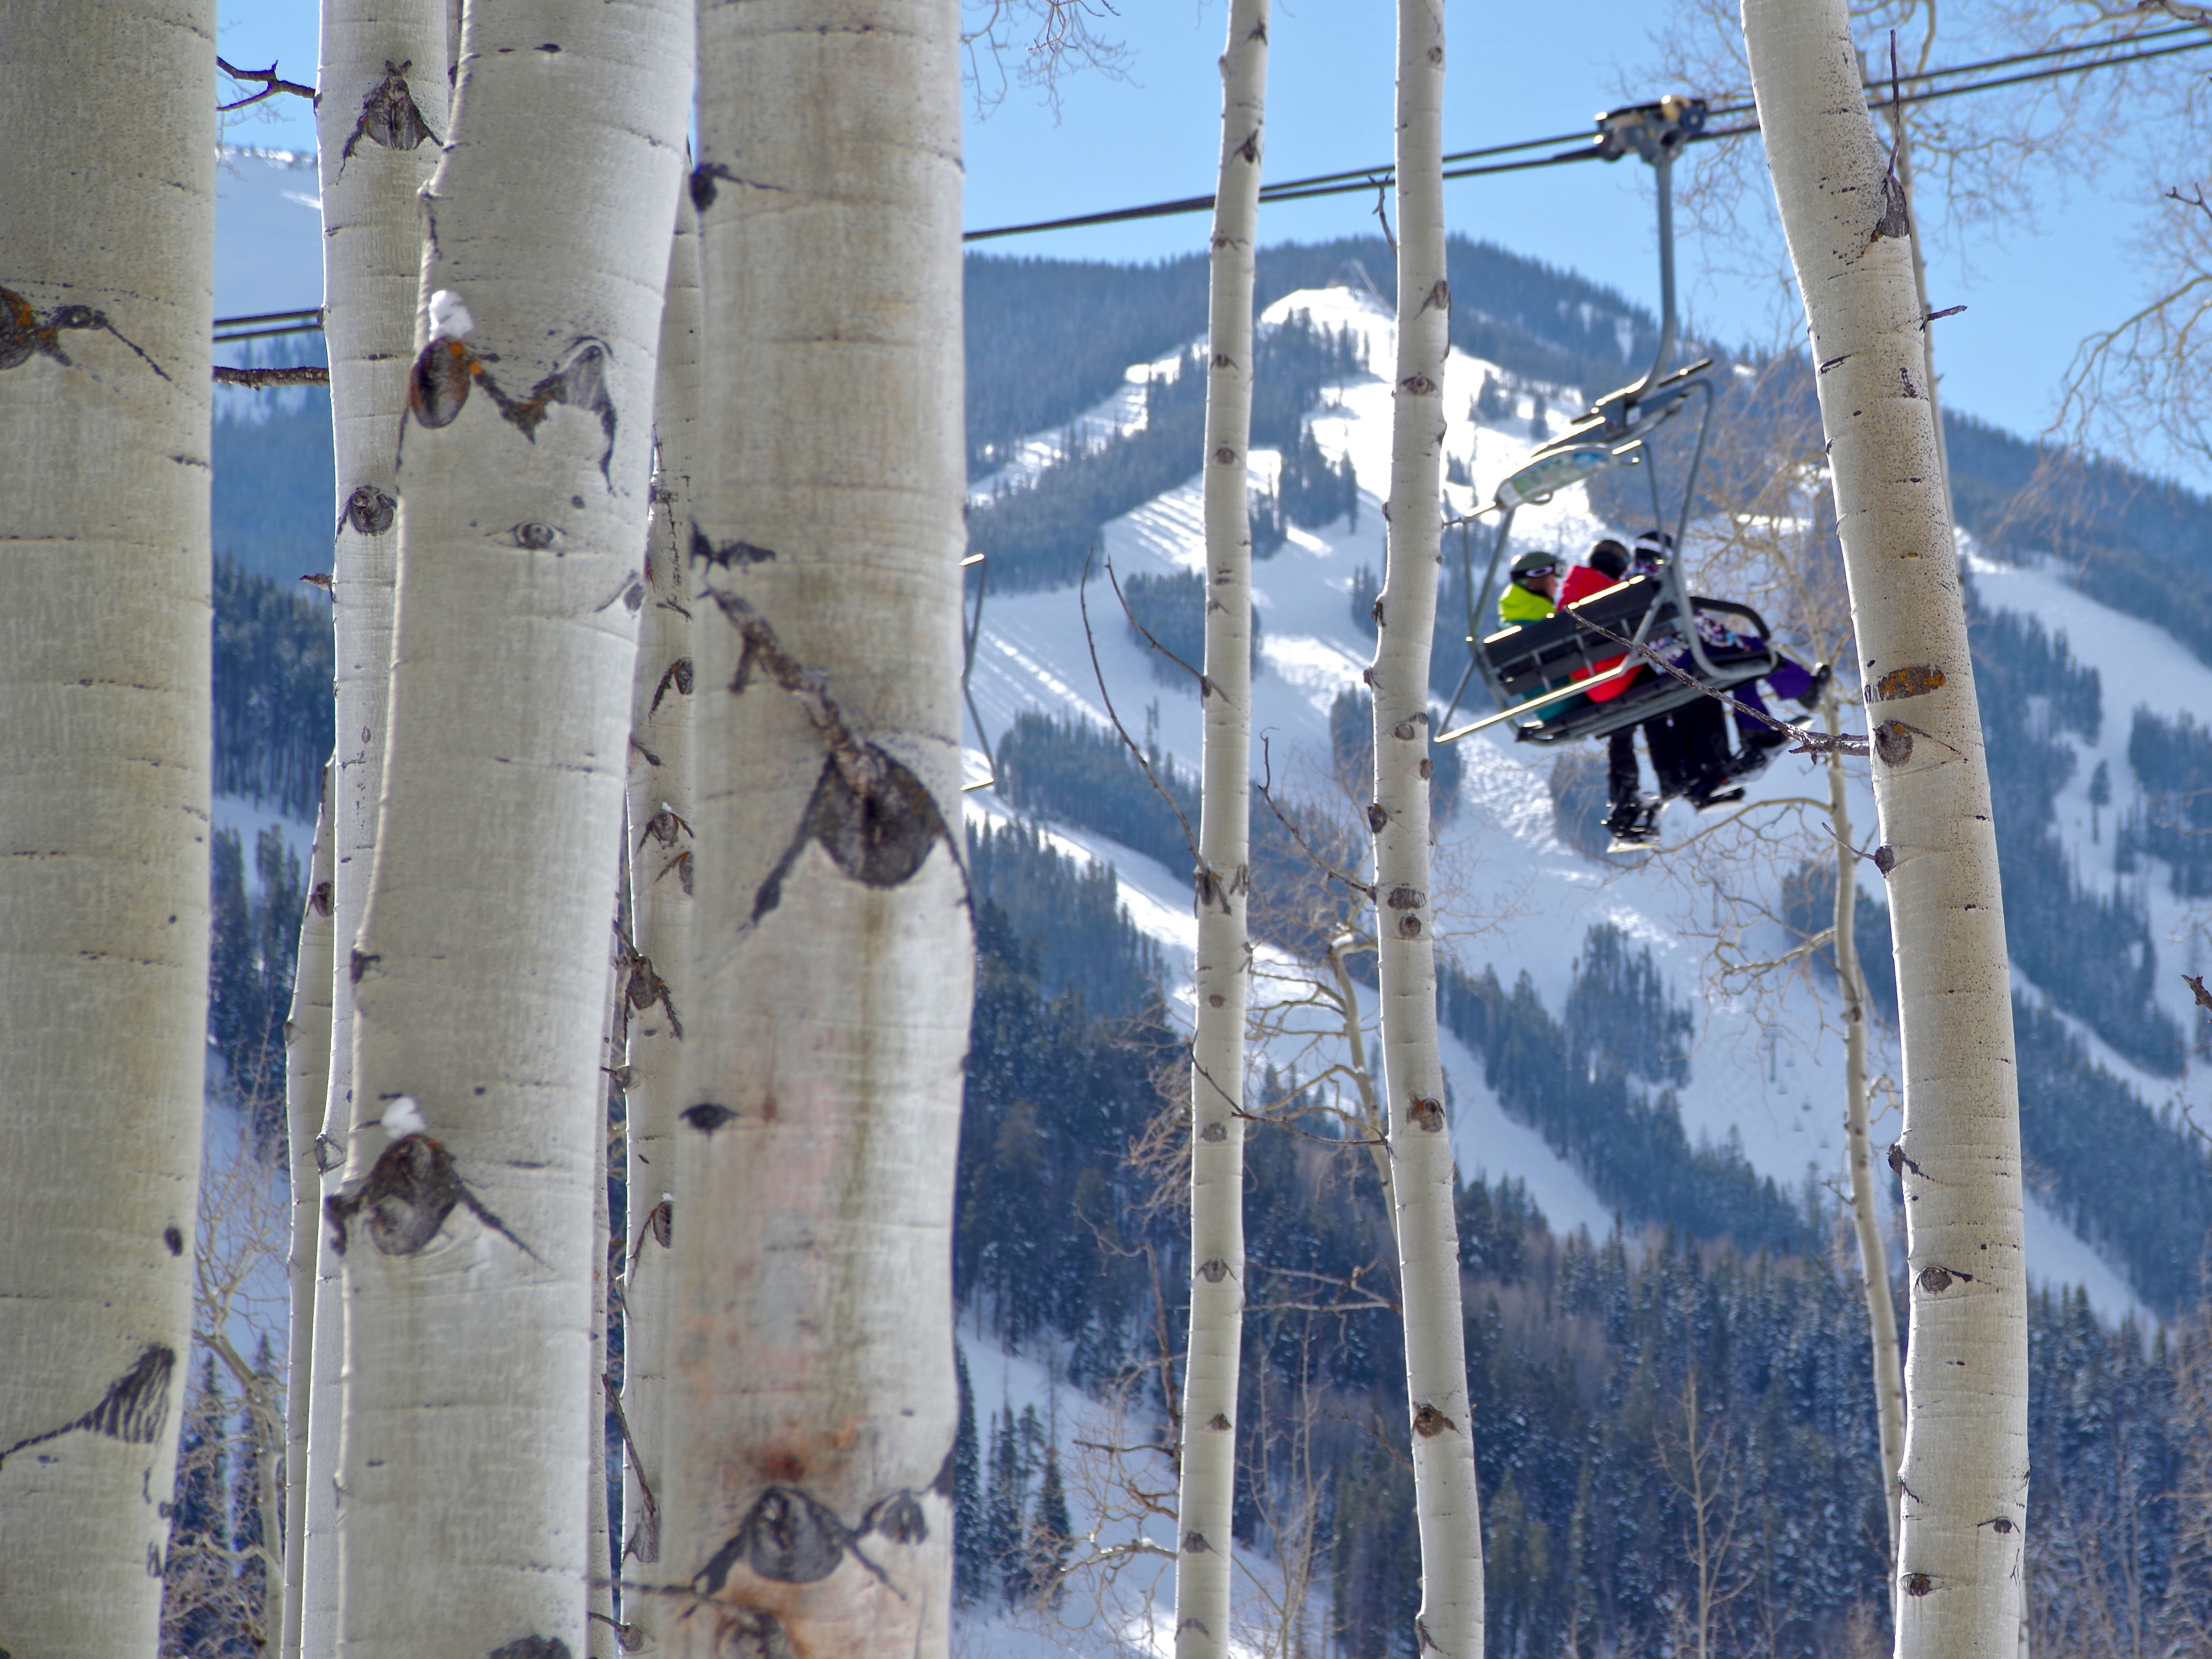 20170118 bc scenic 7 chairlift jonresnick avziak